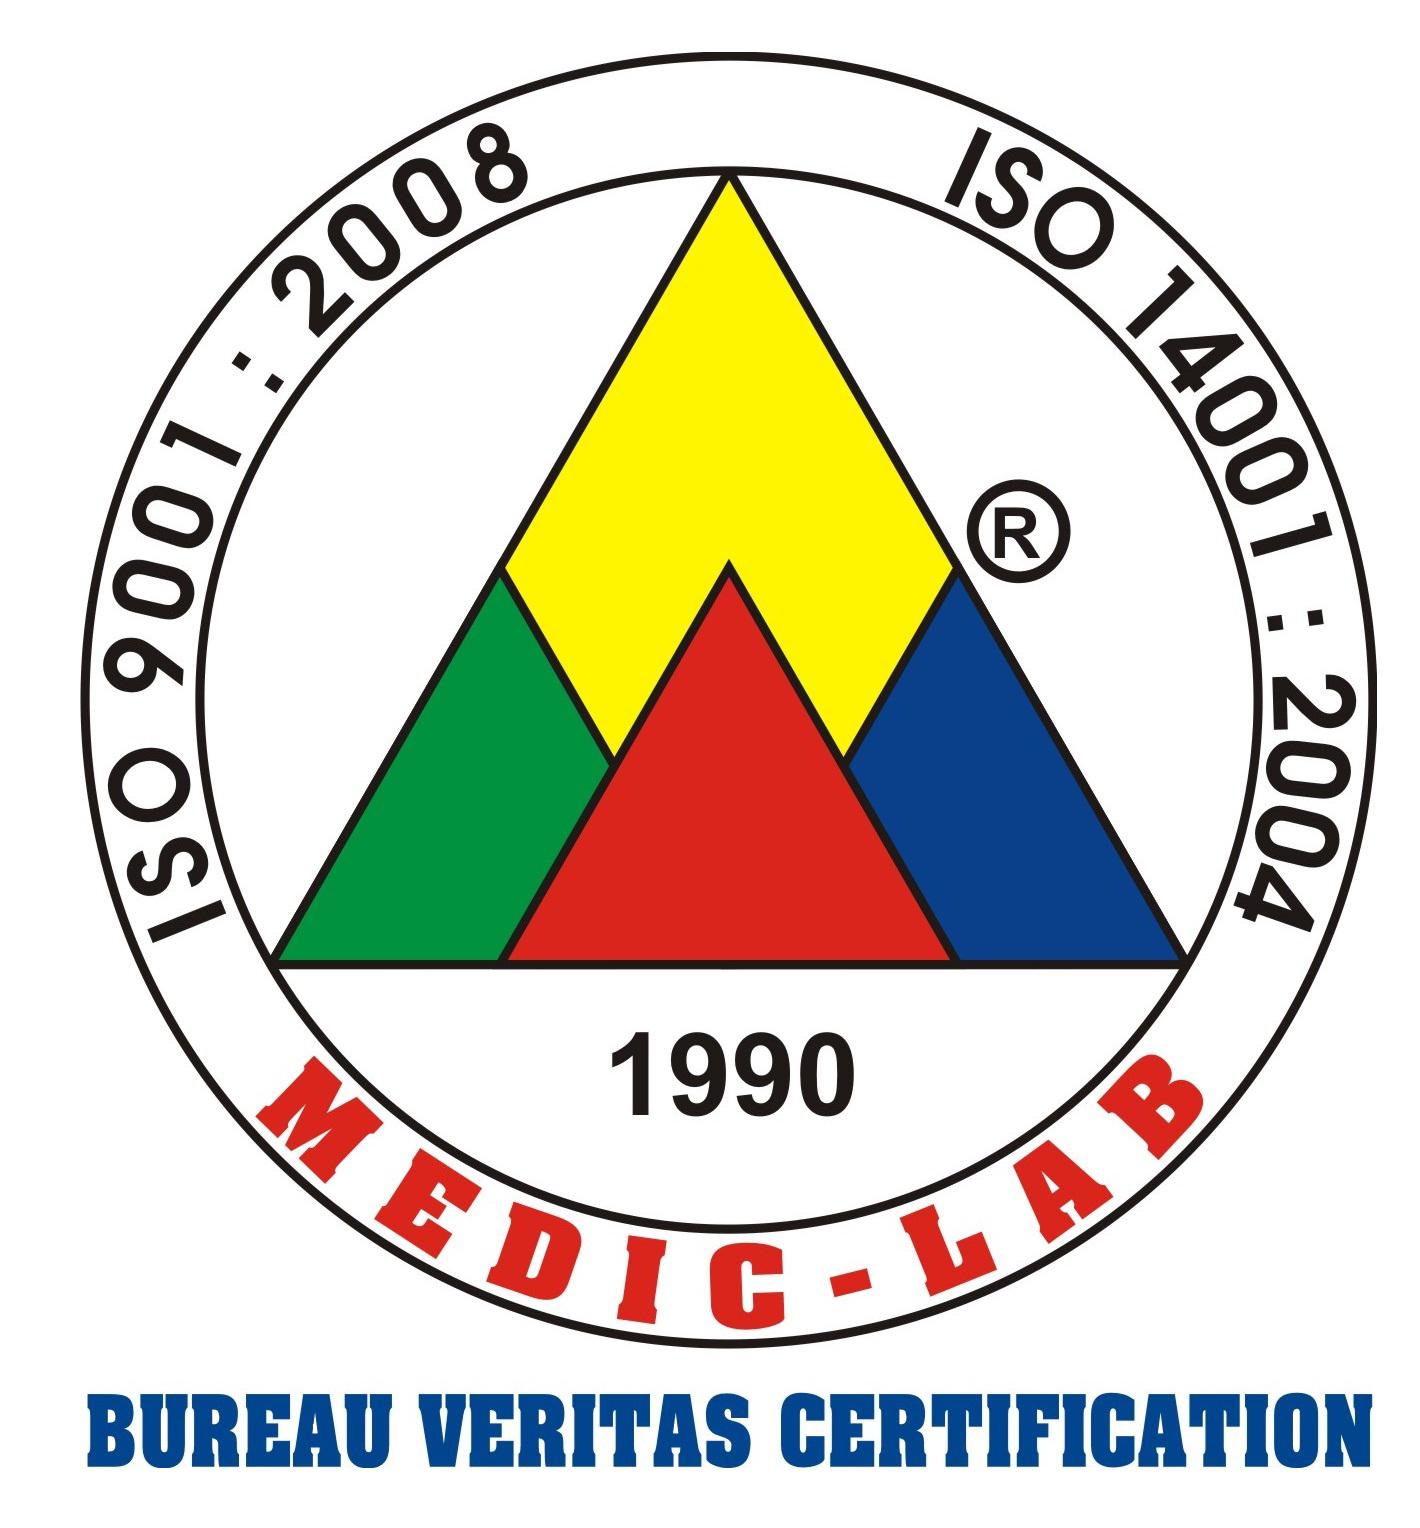 Hoa Hao Medic